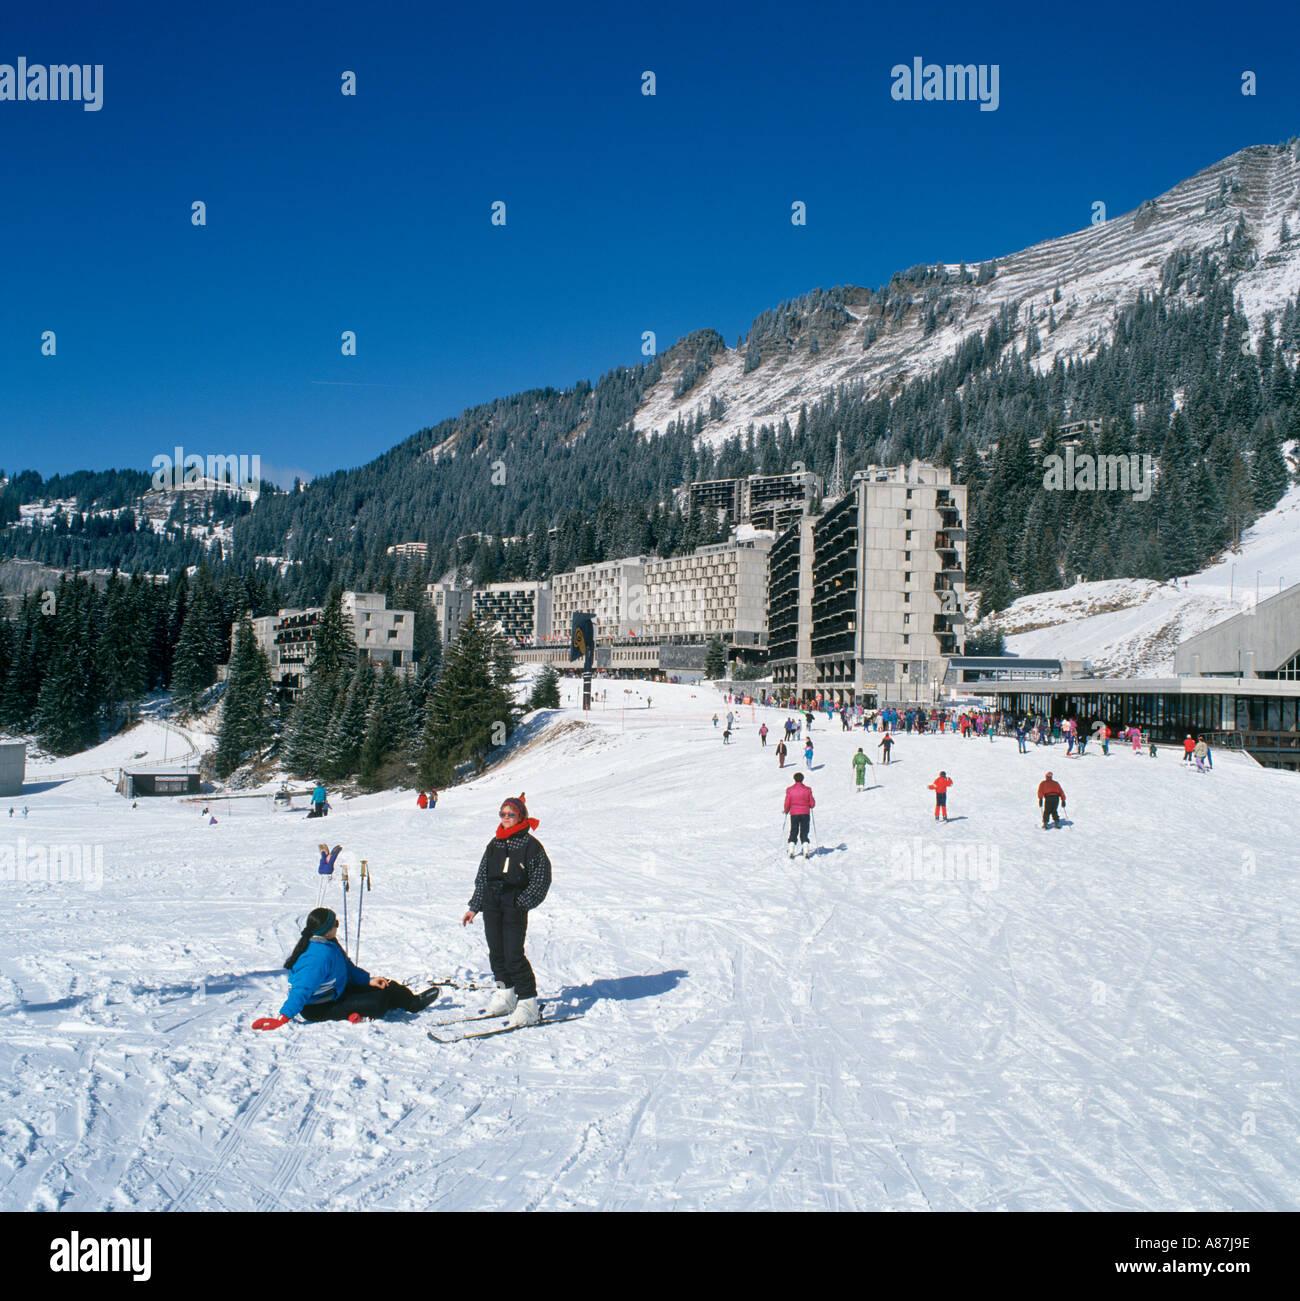 View from the slopes towards Flaine Forum, Flaine, Grand Massif Ski Region, Haute Savoie, France Stock Photo